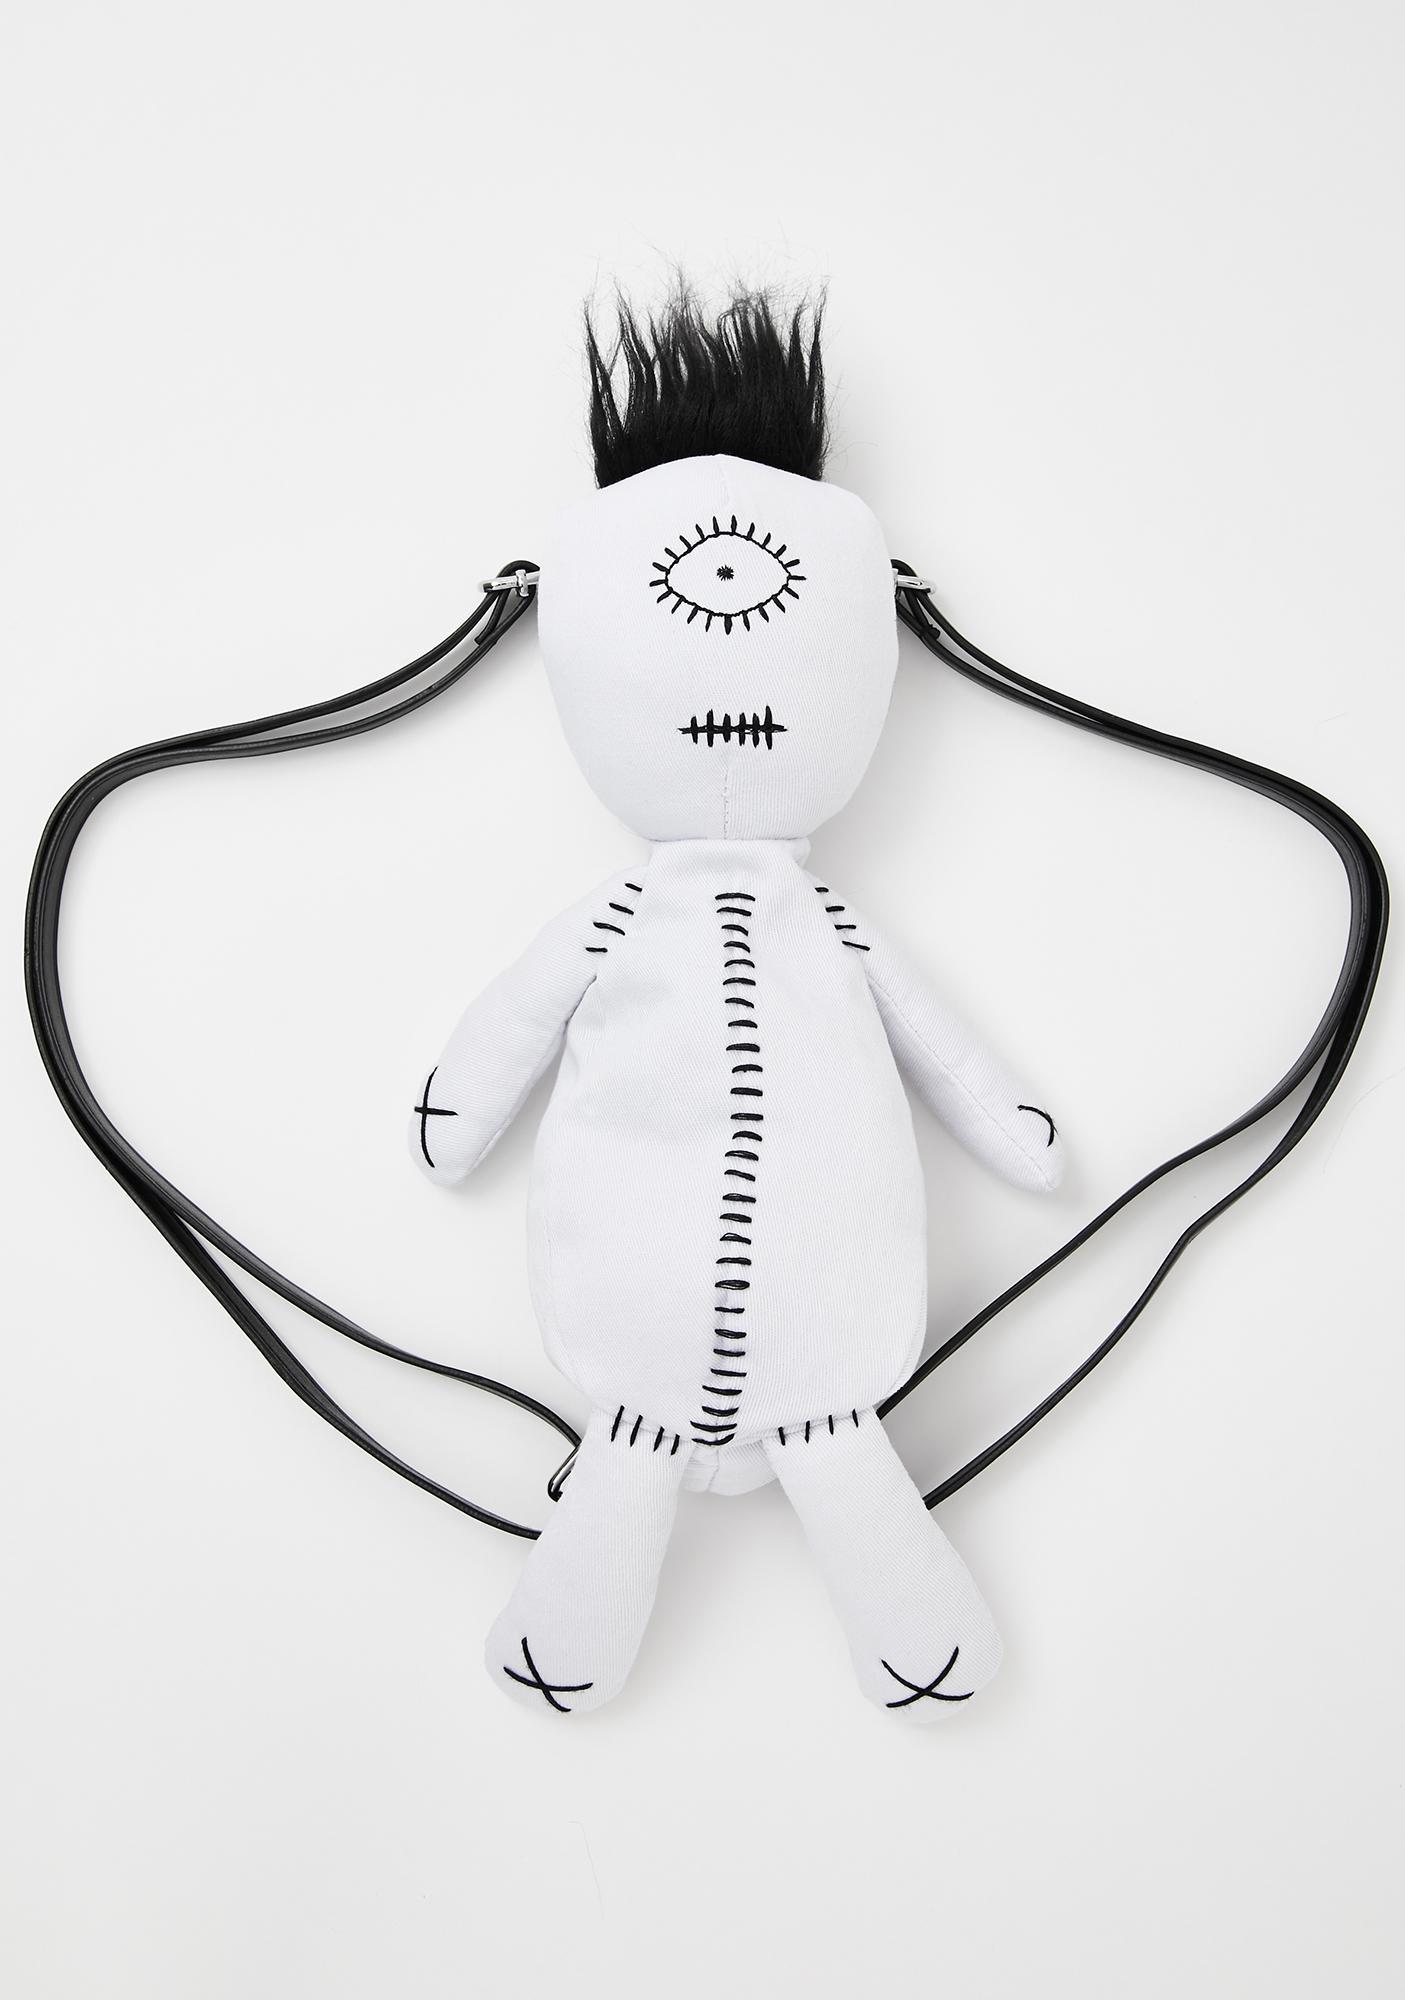 Sugar Thrillz Meet My Ex Voodoo Doll Backpack